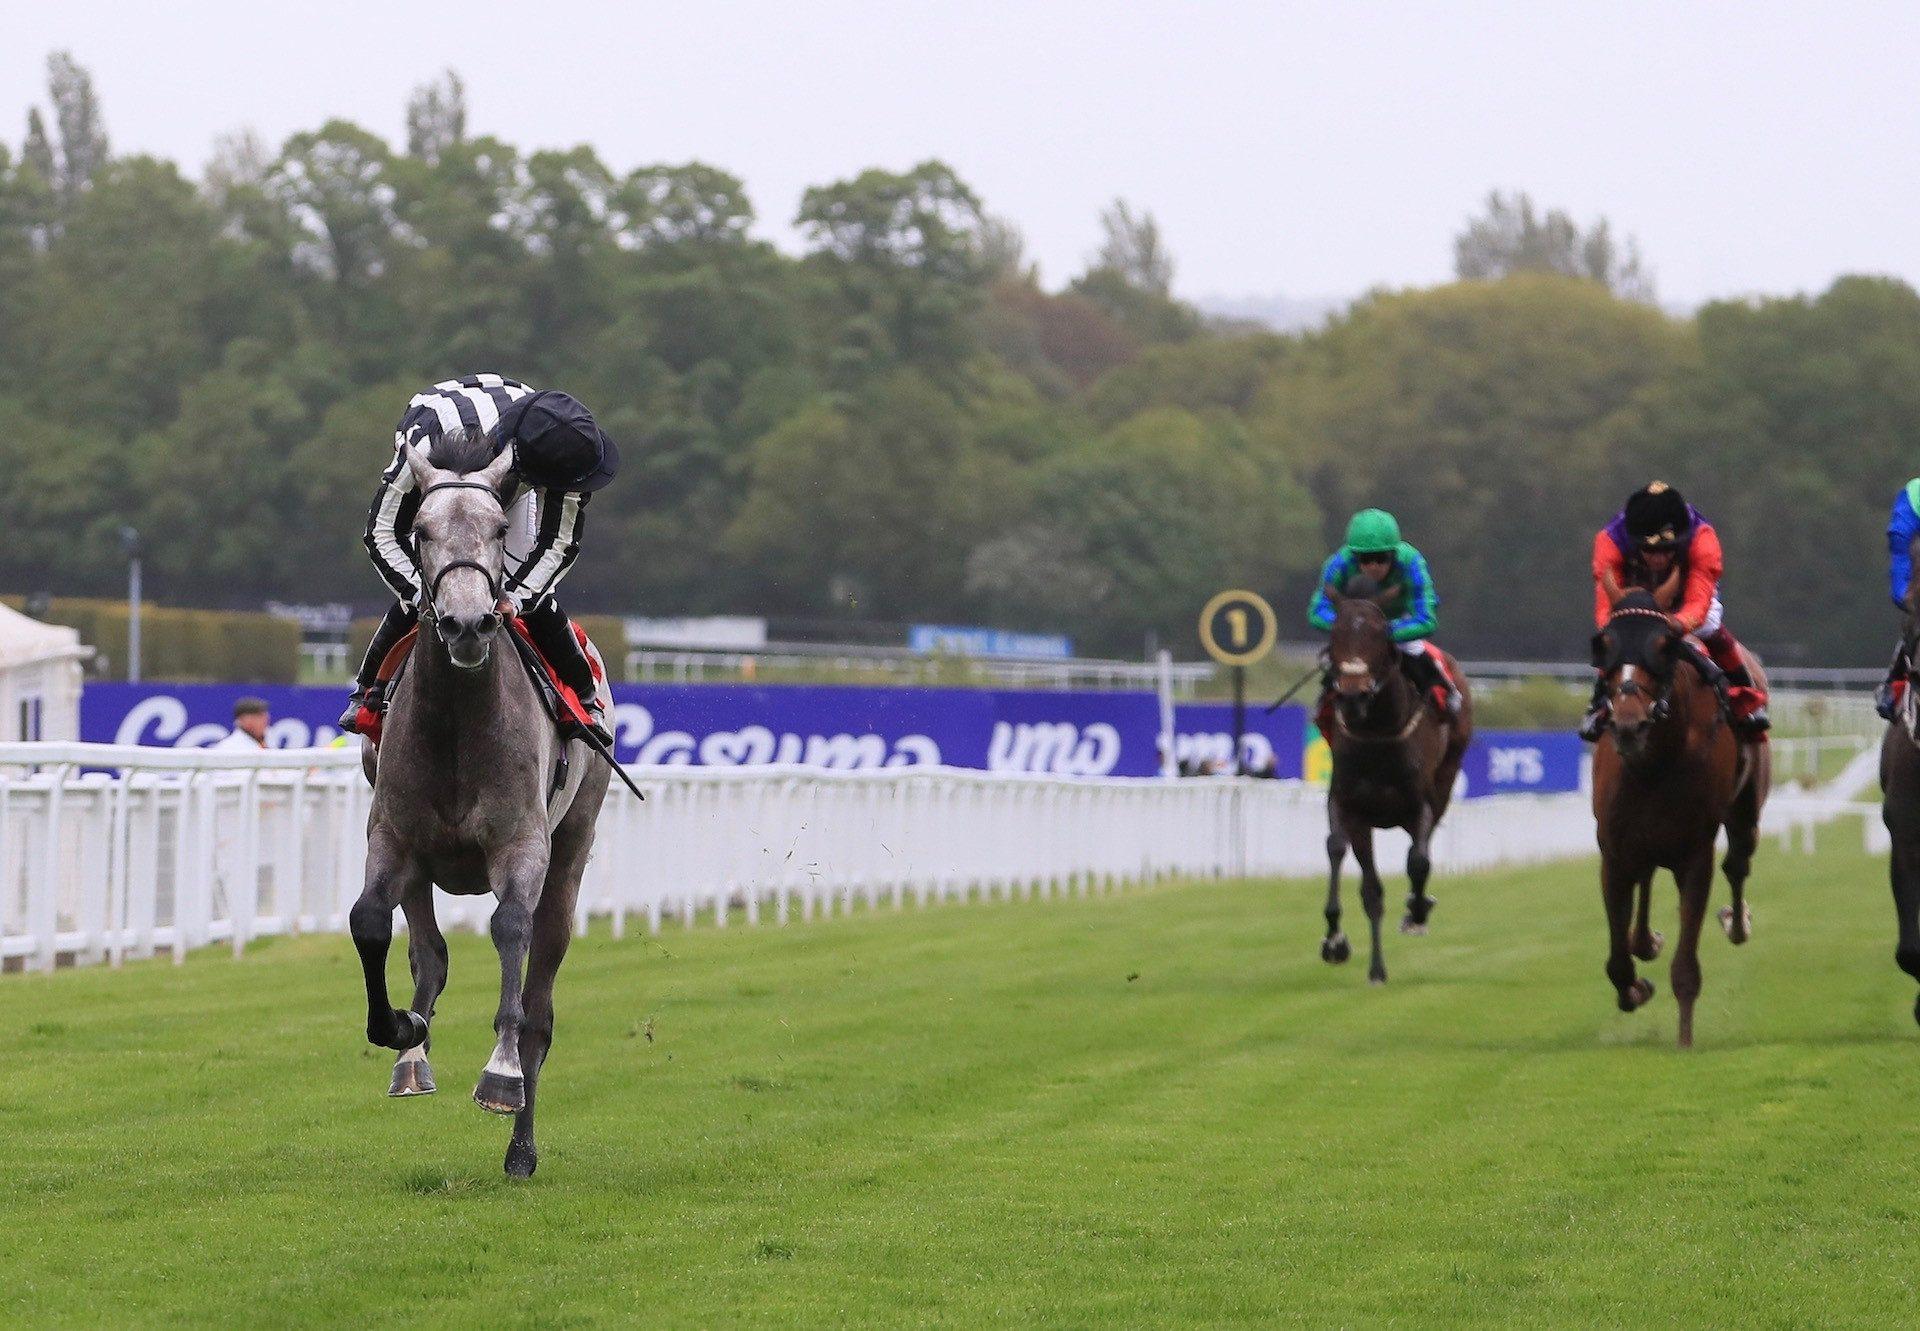 Zinc White (Vadamos) Wins Impressively At Sandown